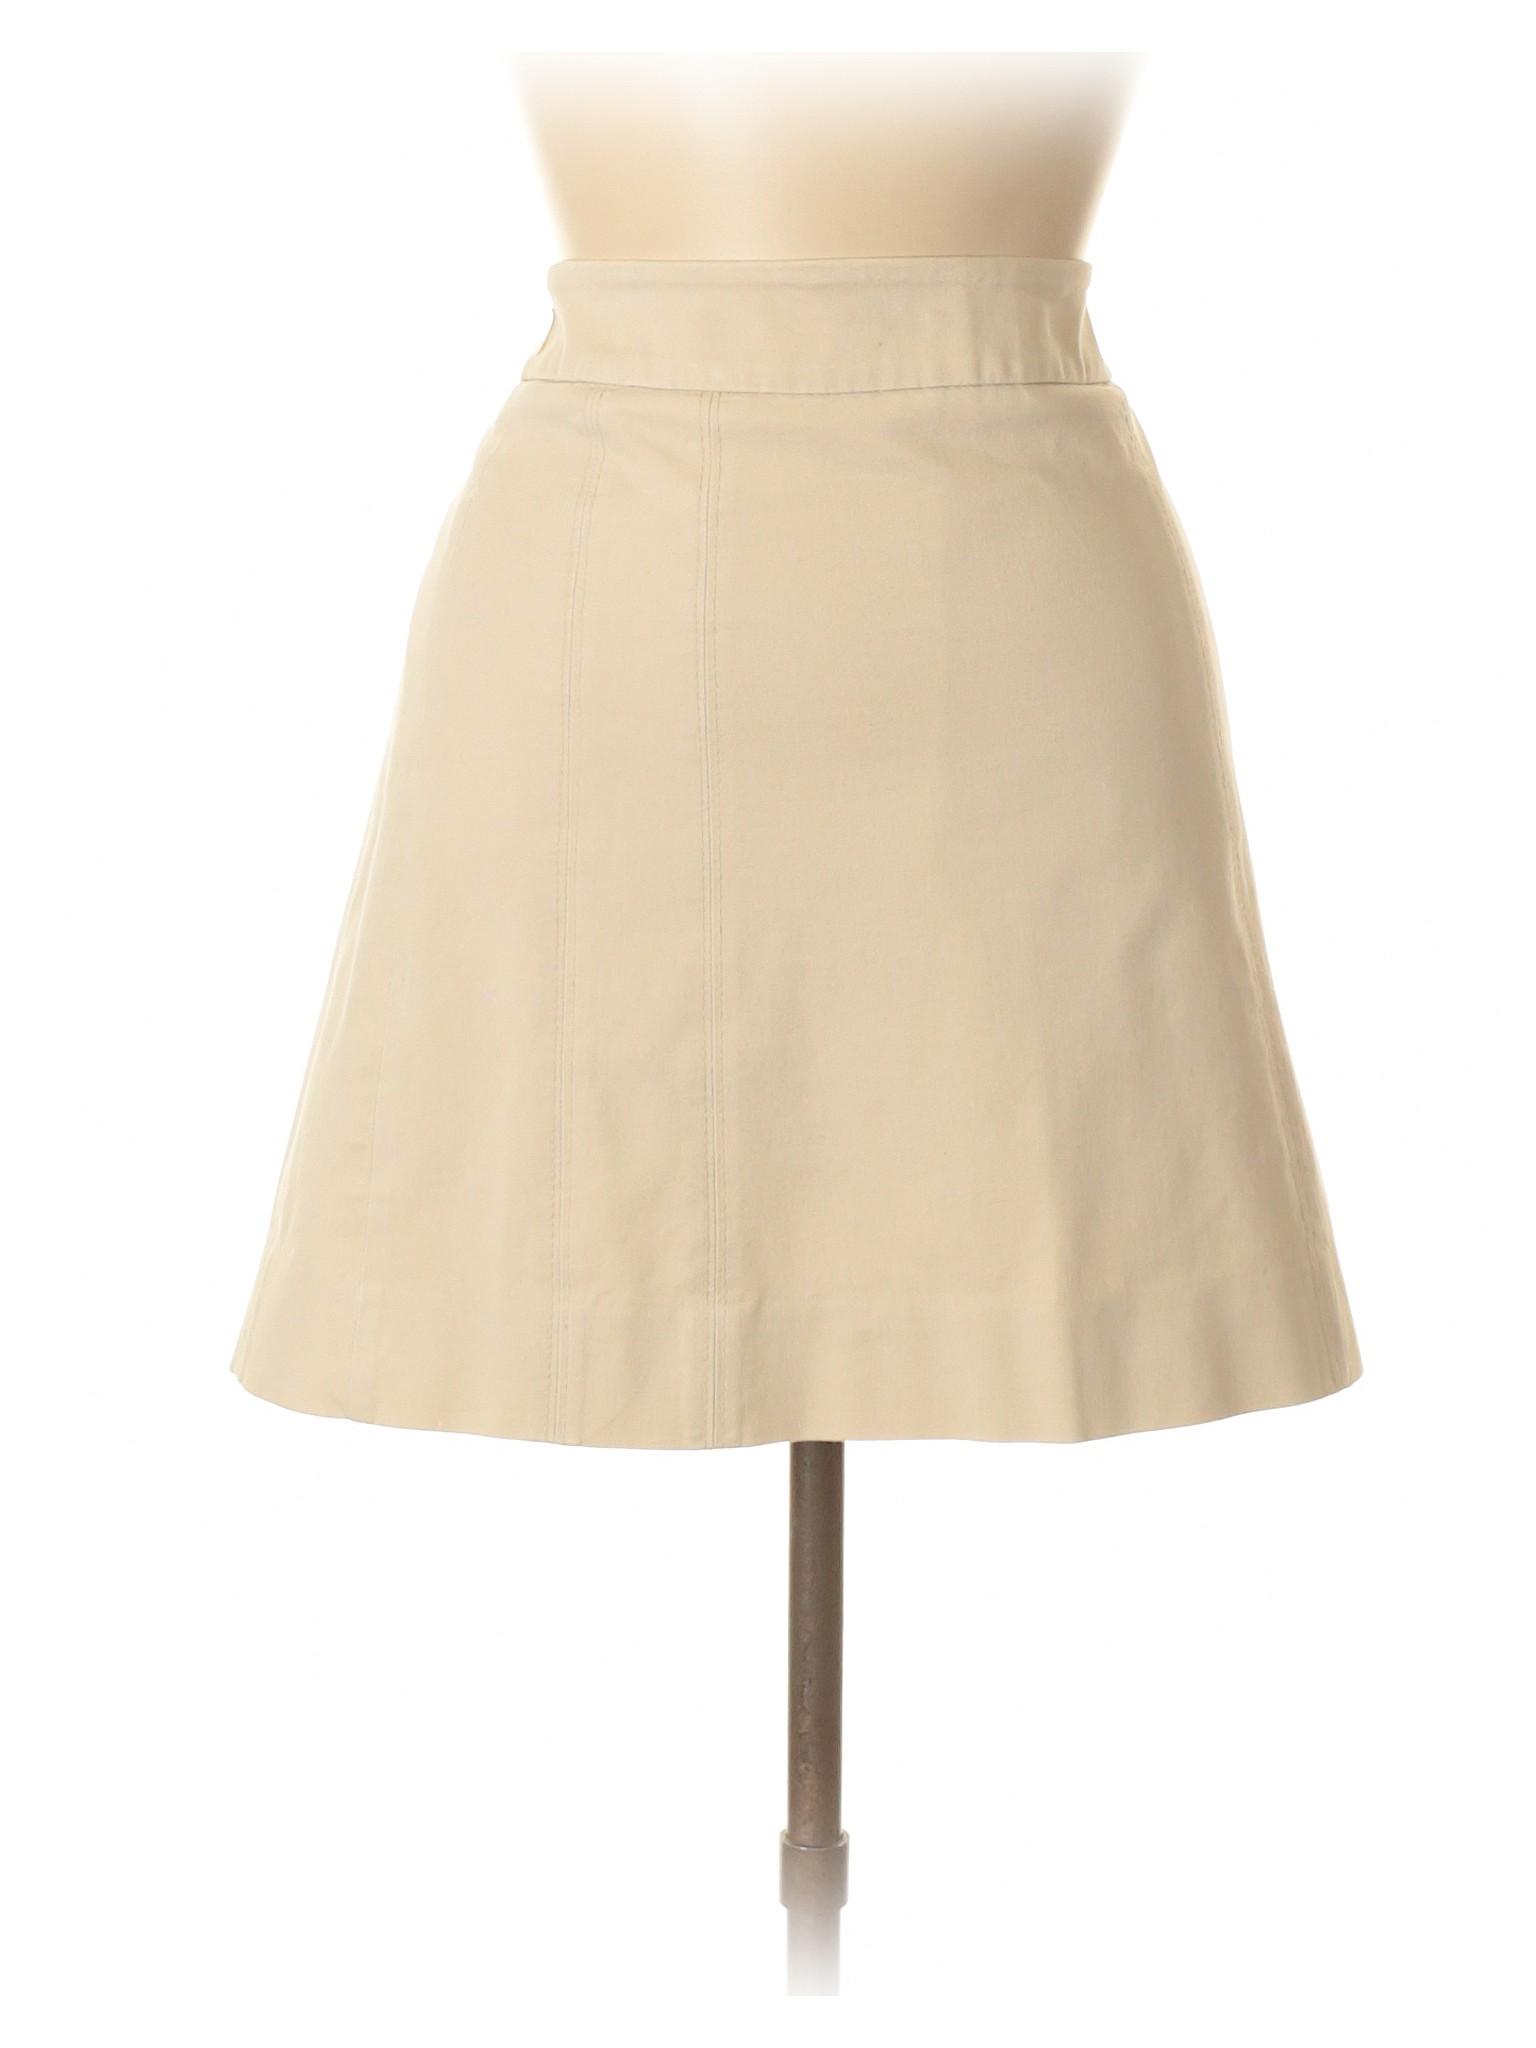 Skirt Skirt Casual Boutique Casual Boutique Boutique Skirt Skirt Boutique Boutique Casual Casual Casual Skirt Skirt Casual Boutique wxgzw0A